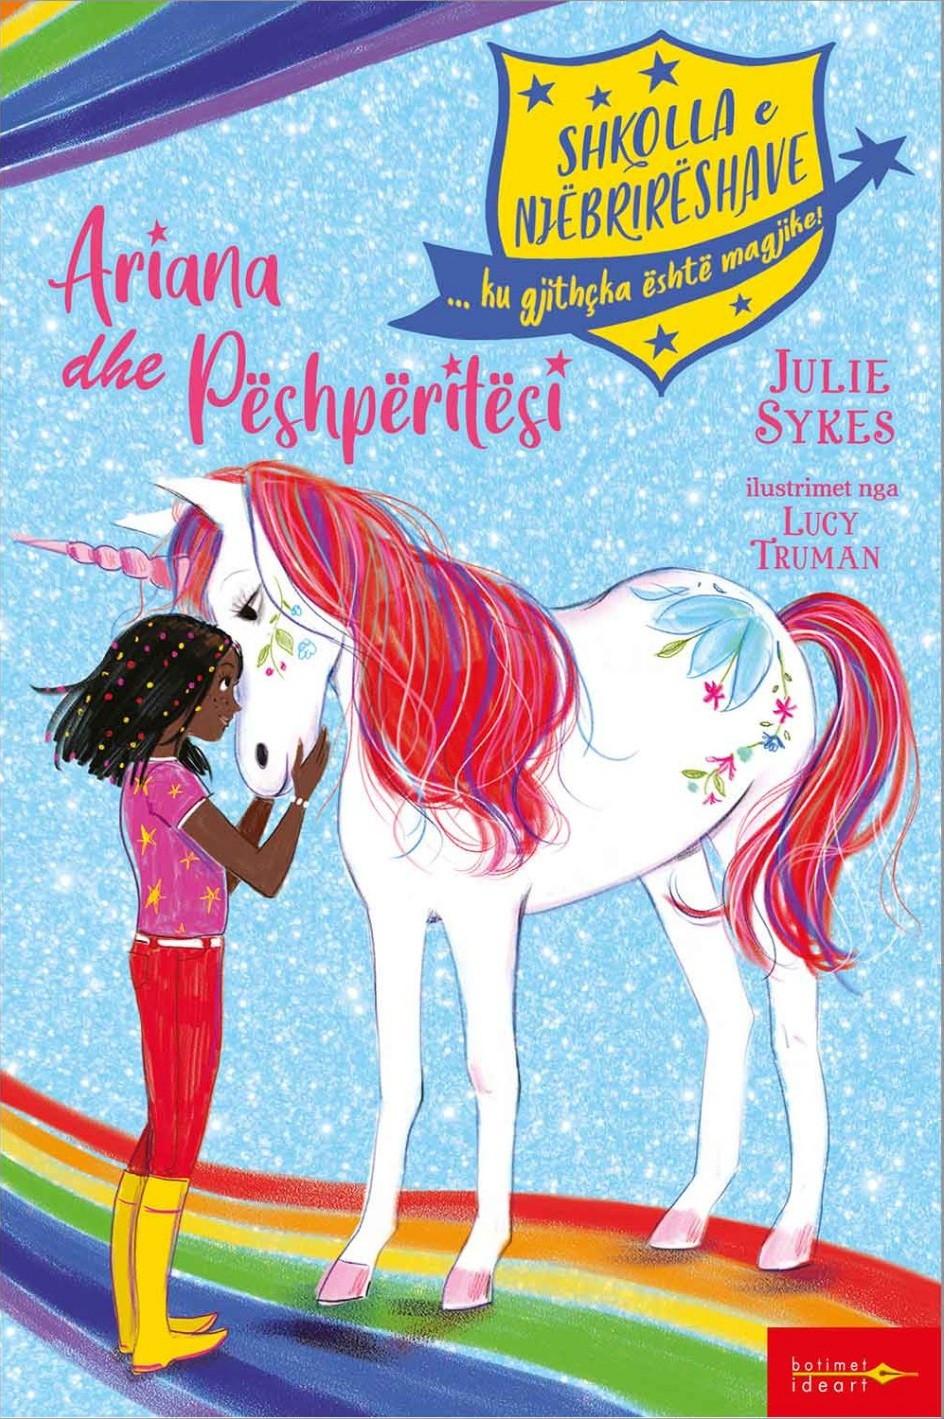 Shkolla e njebrireshave - Ariana dhe peshperitesi